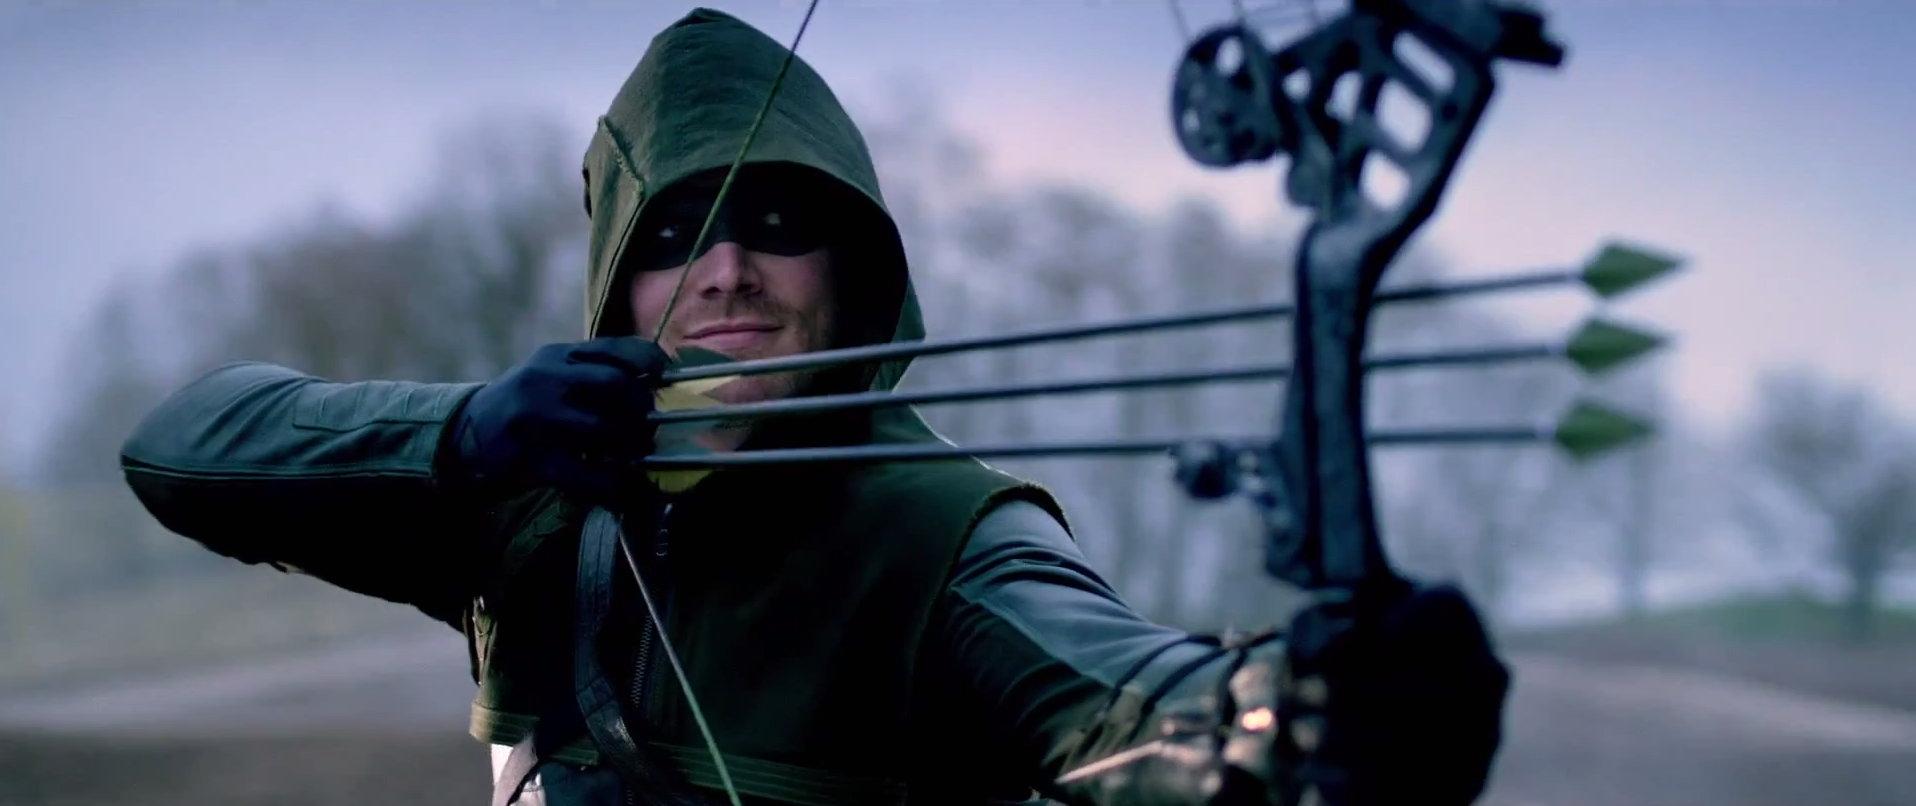 SDCC First Look At Season Of Arrow We Geek Girls